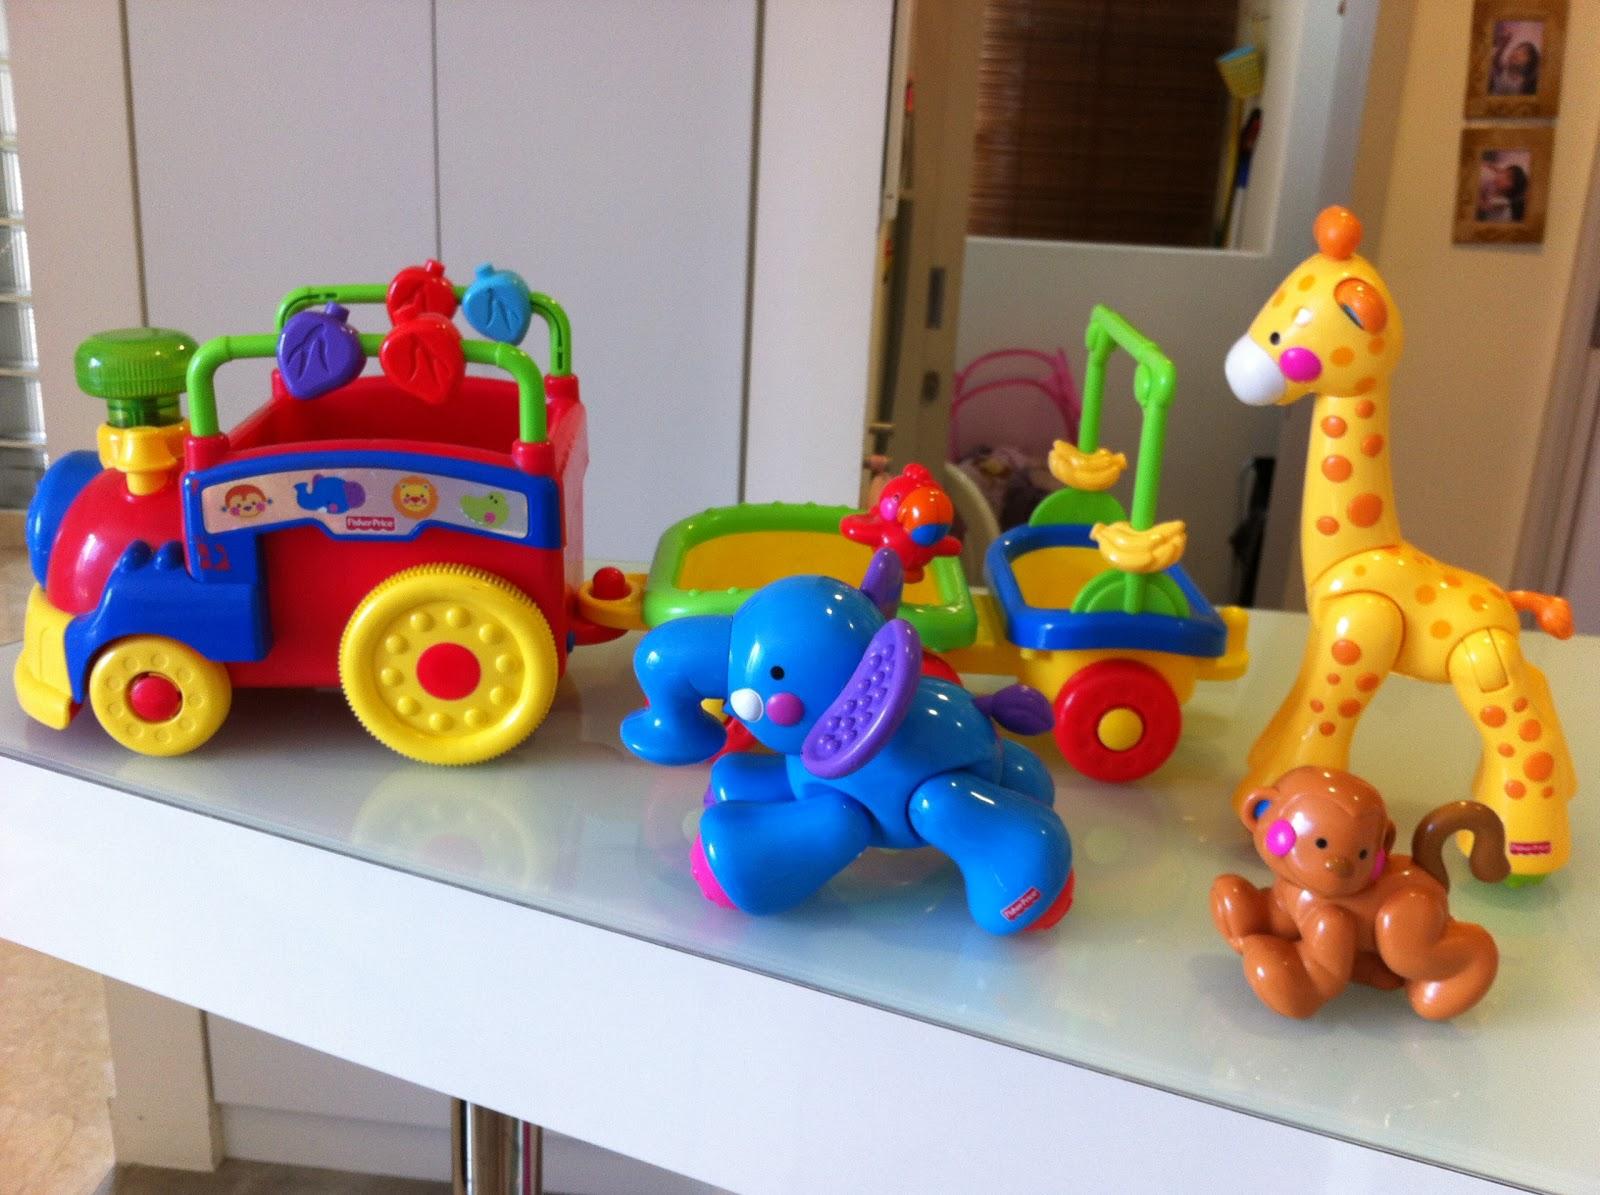 Animal Train Set : Preloved baby stuff for sale fisher price animal train